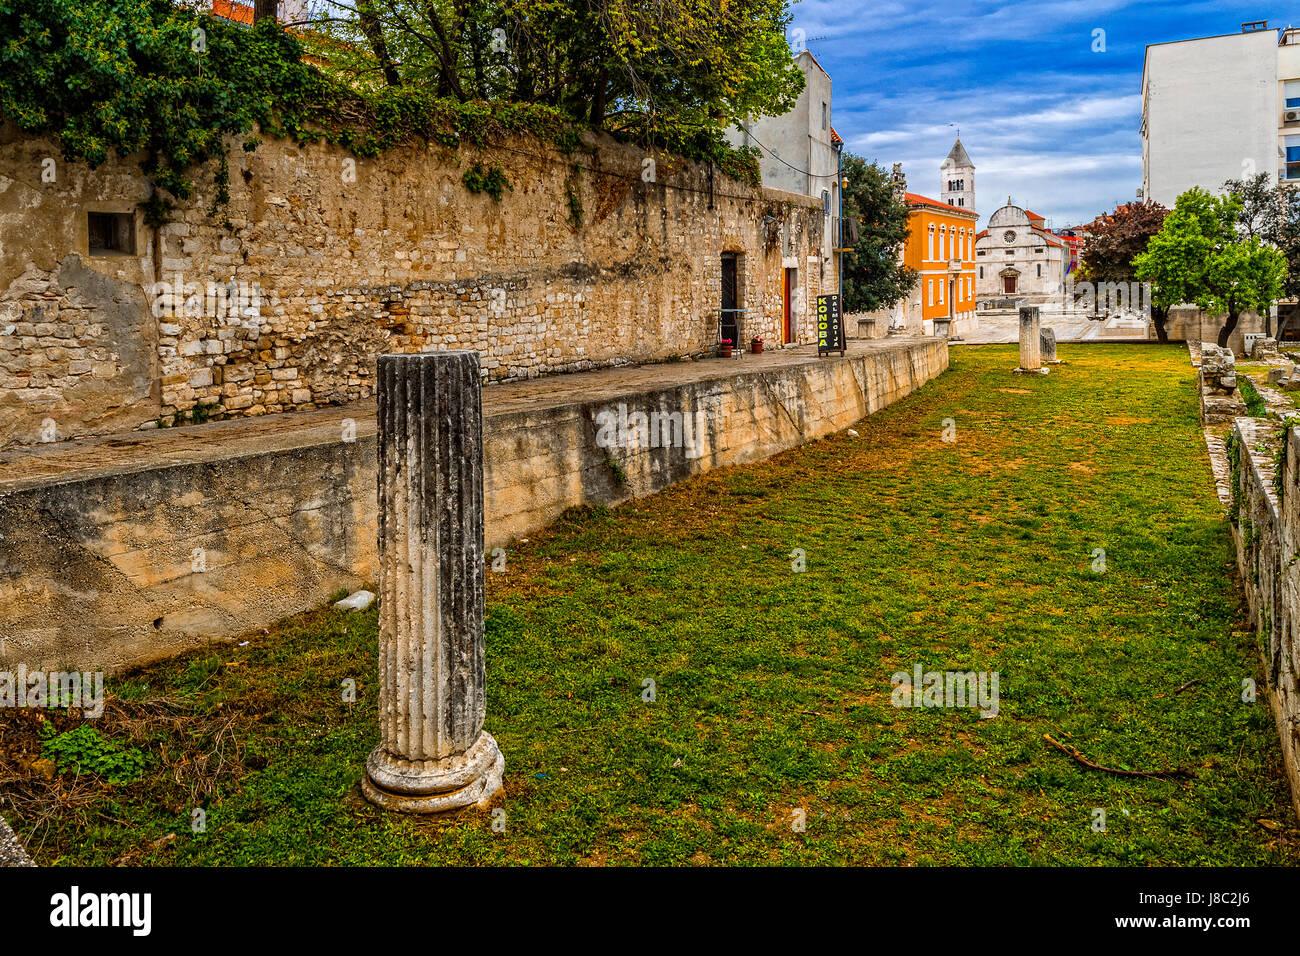 Dalmatia Zadar  roman forum and in background st. Mary's church - Stock Image